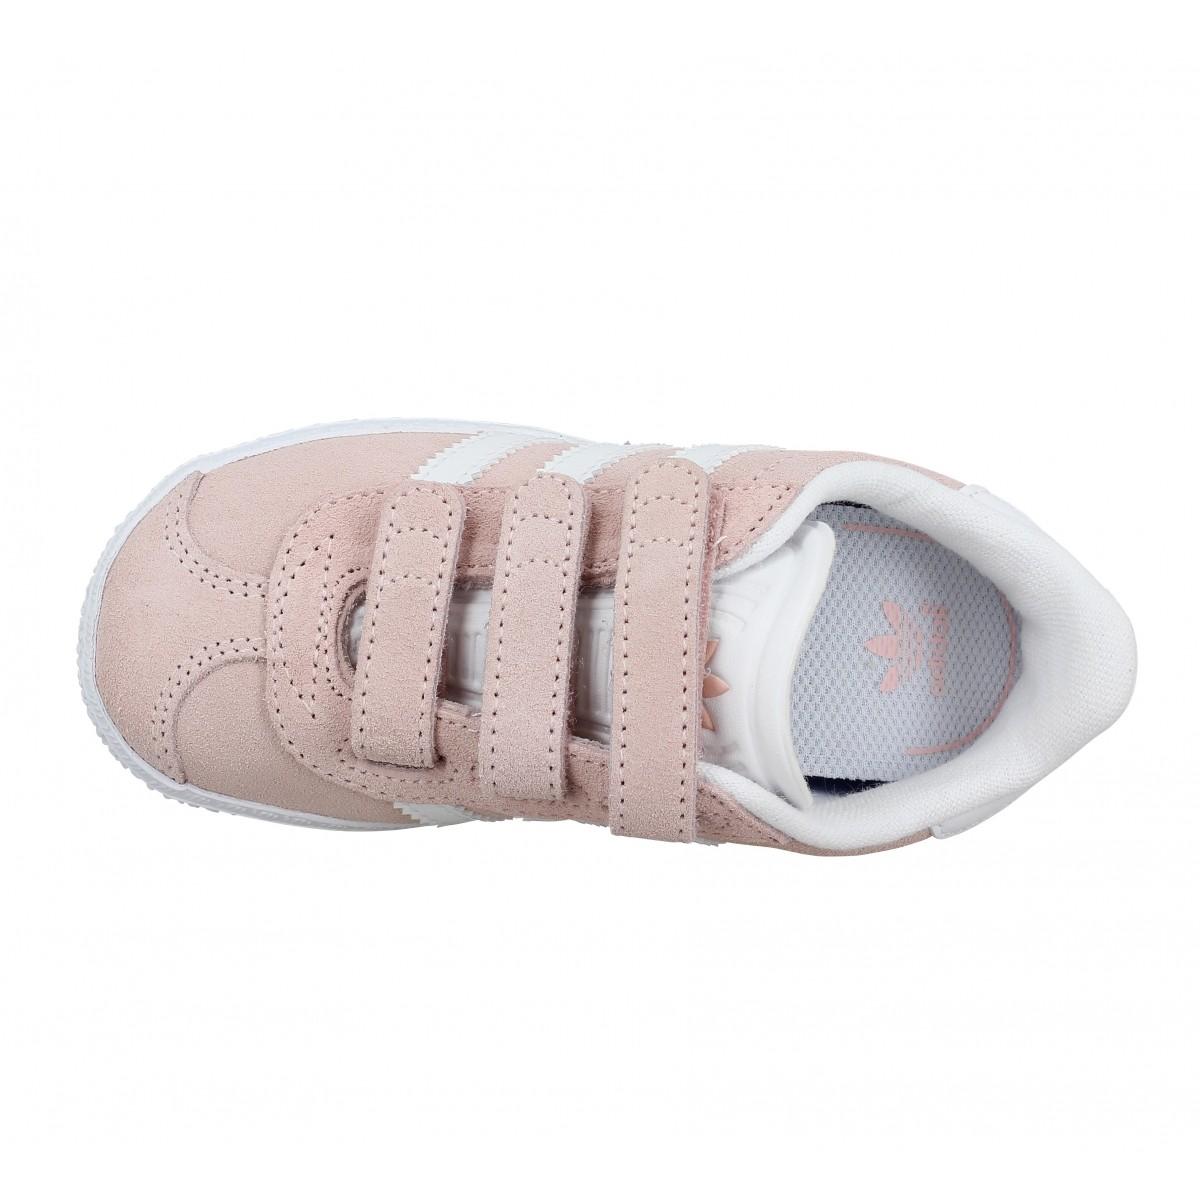 Chaussures Adidas gazelle velours enfant rose enfants